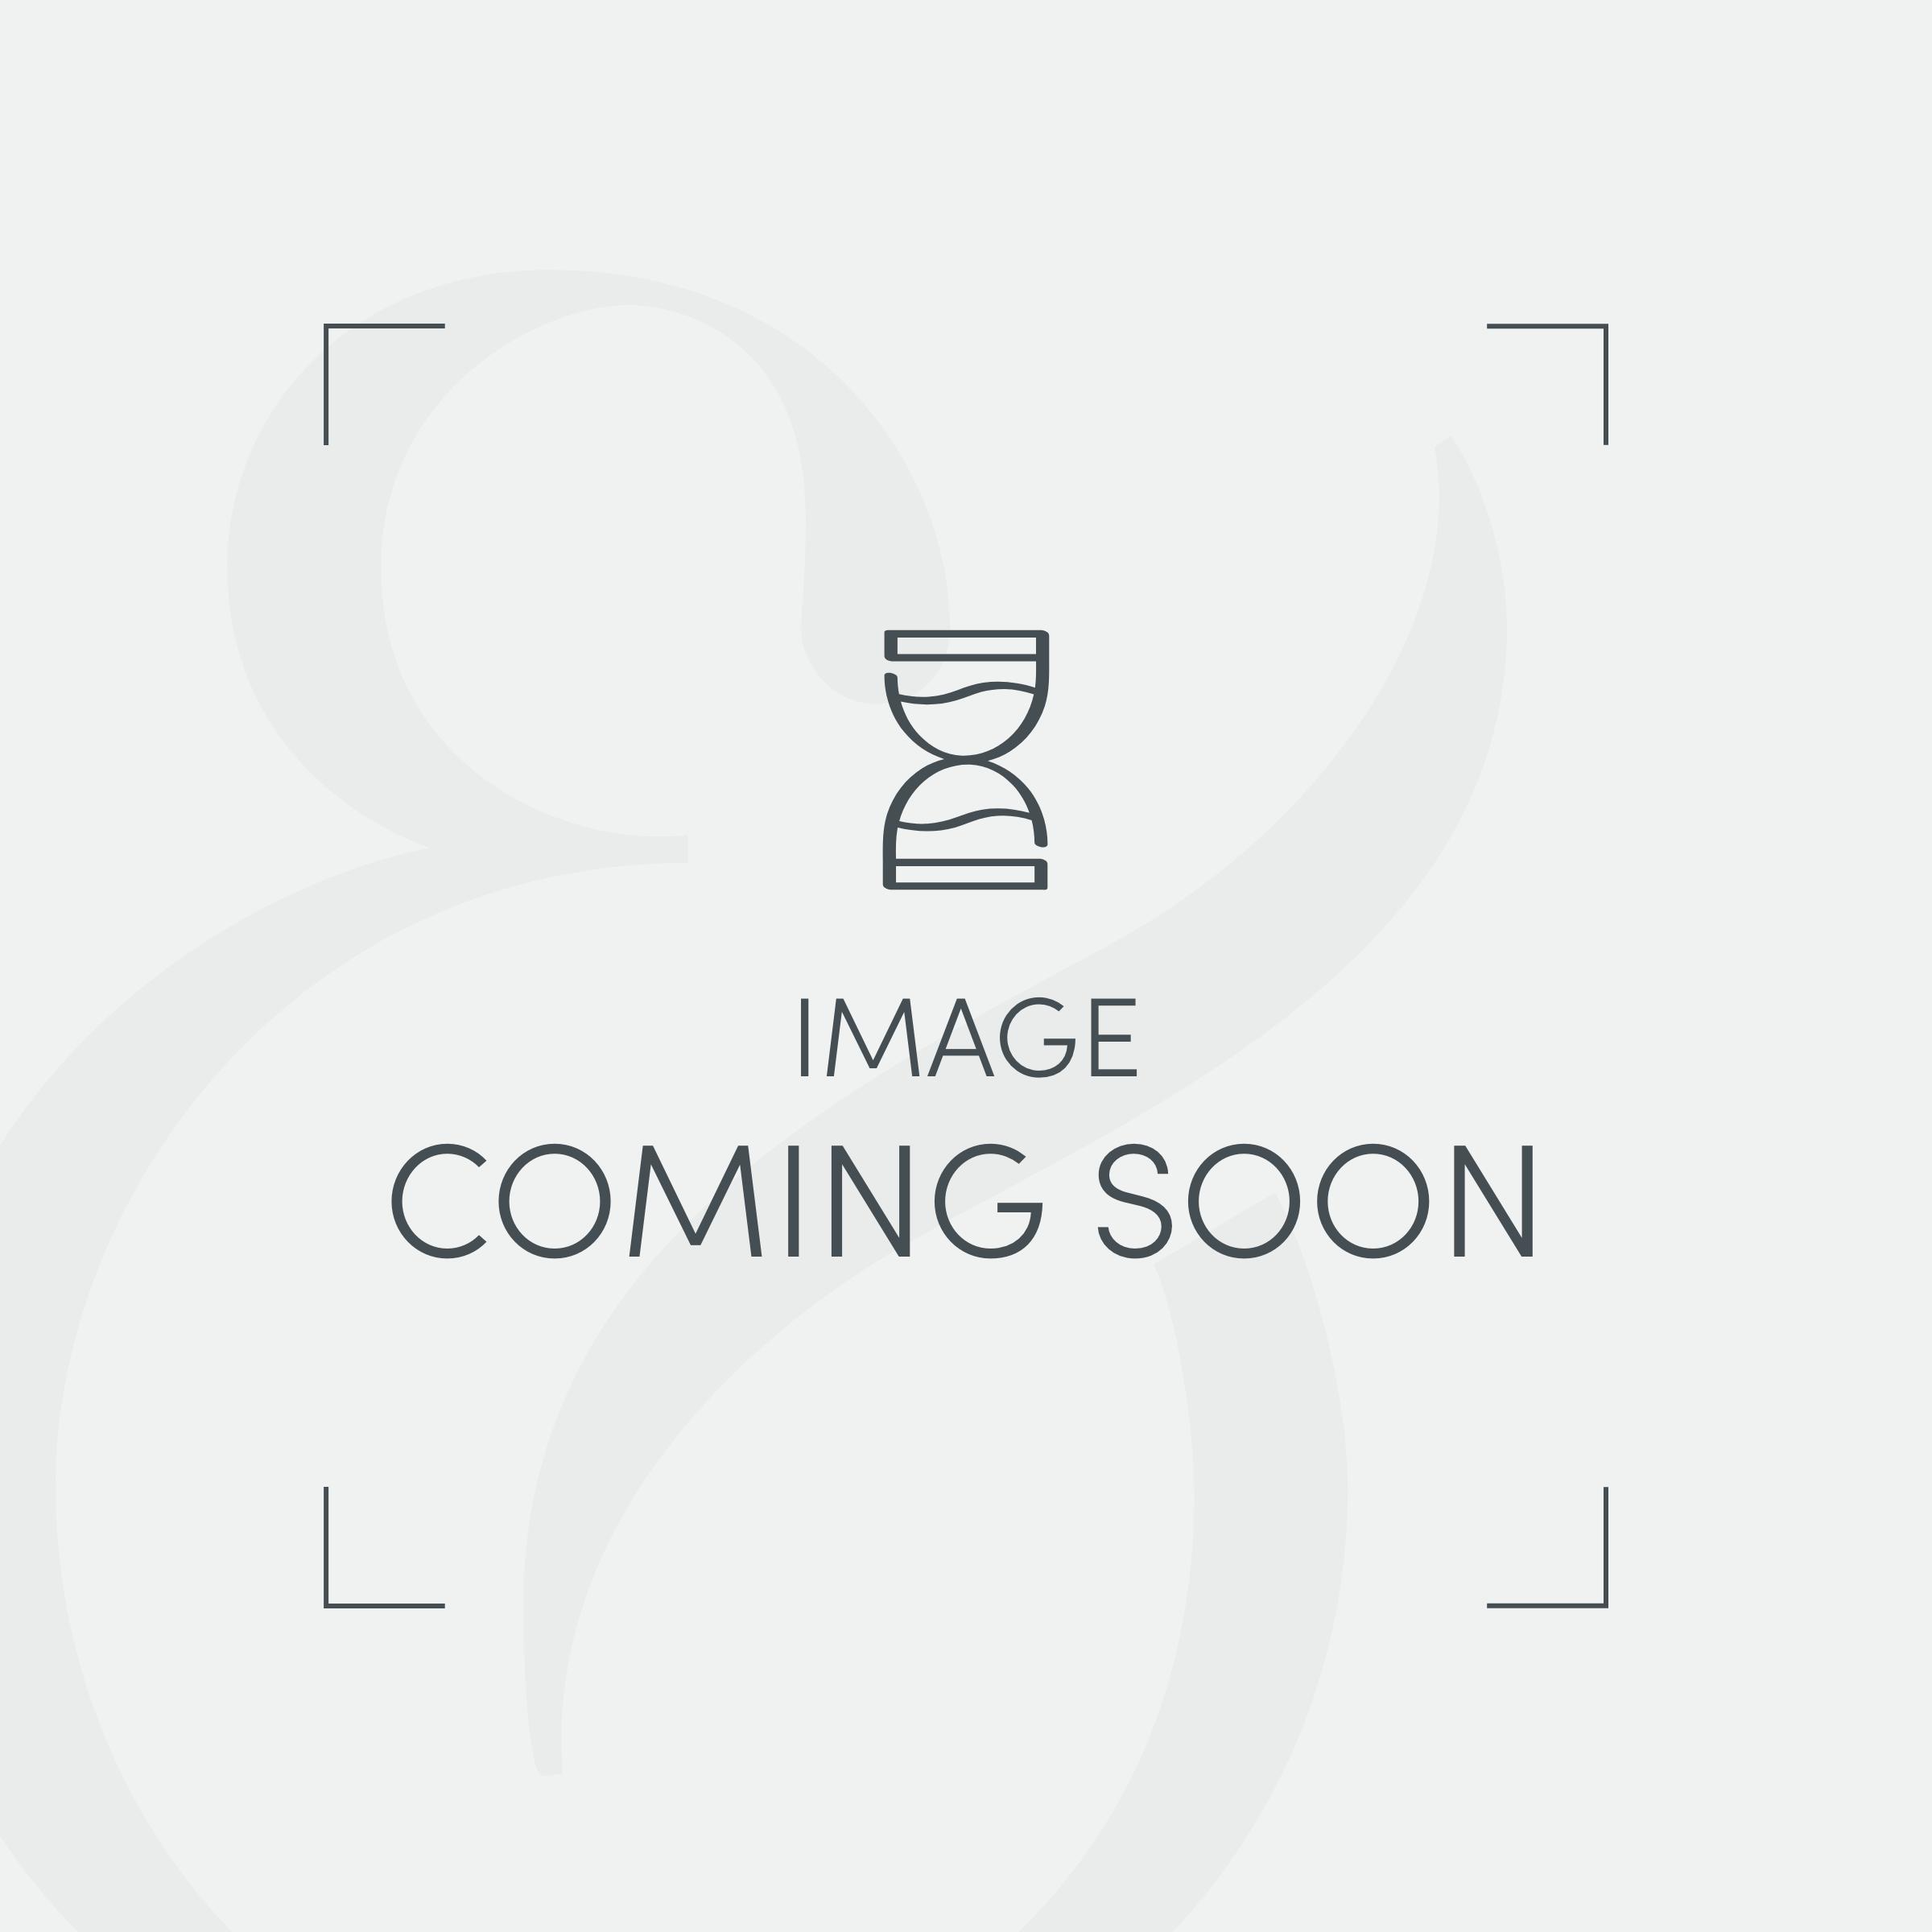 Luxury Egyptian Towel Set (2 x Face Cloths, 2 x Hand Towels, 2 x Bath Towels) - Smoke